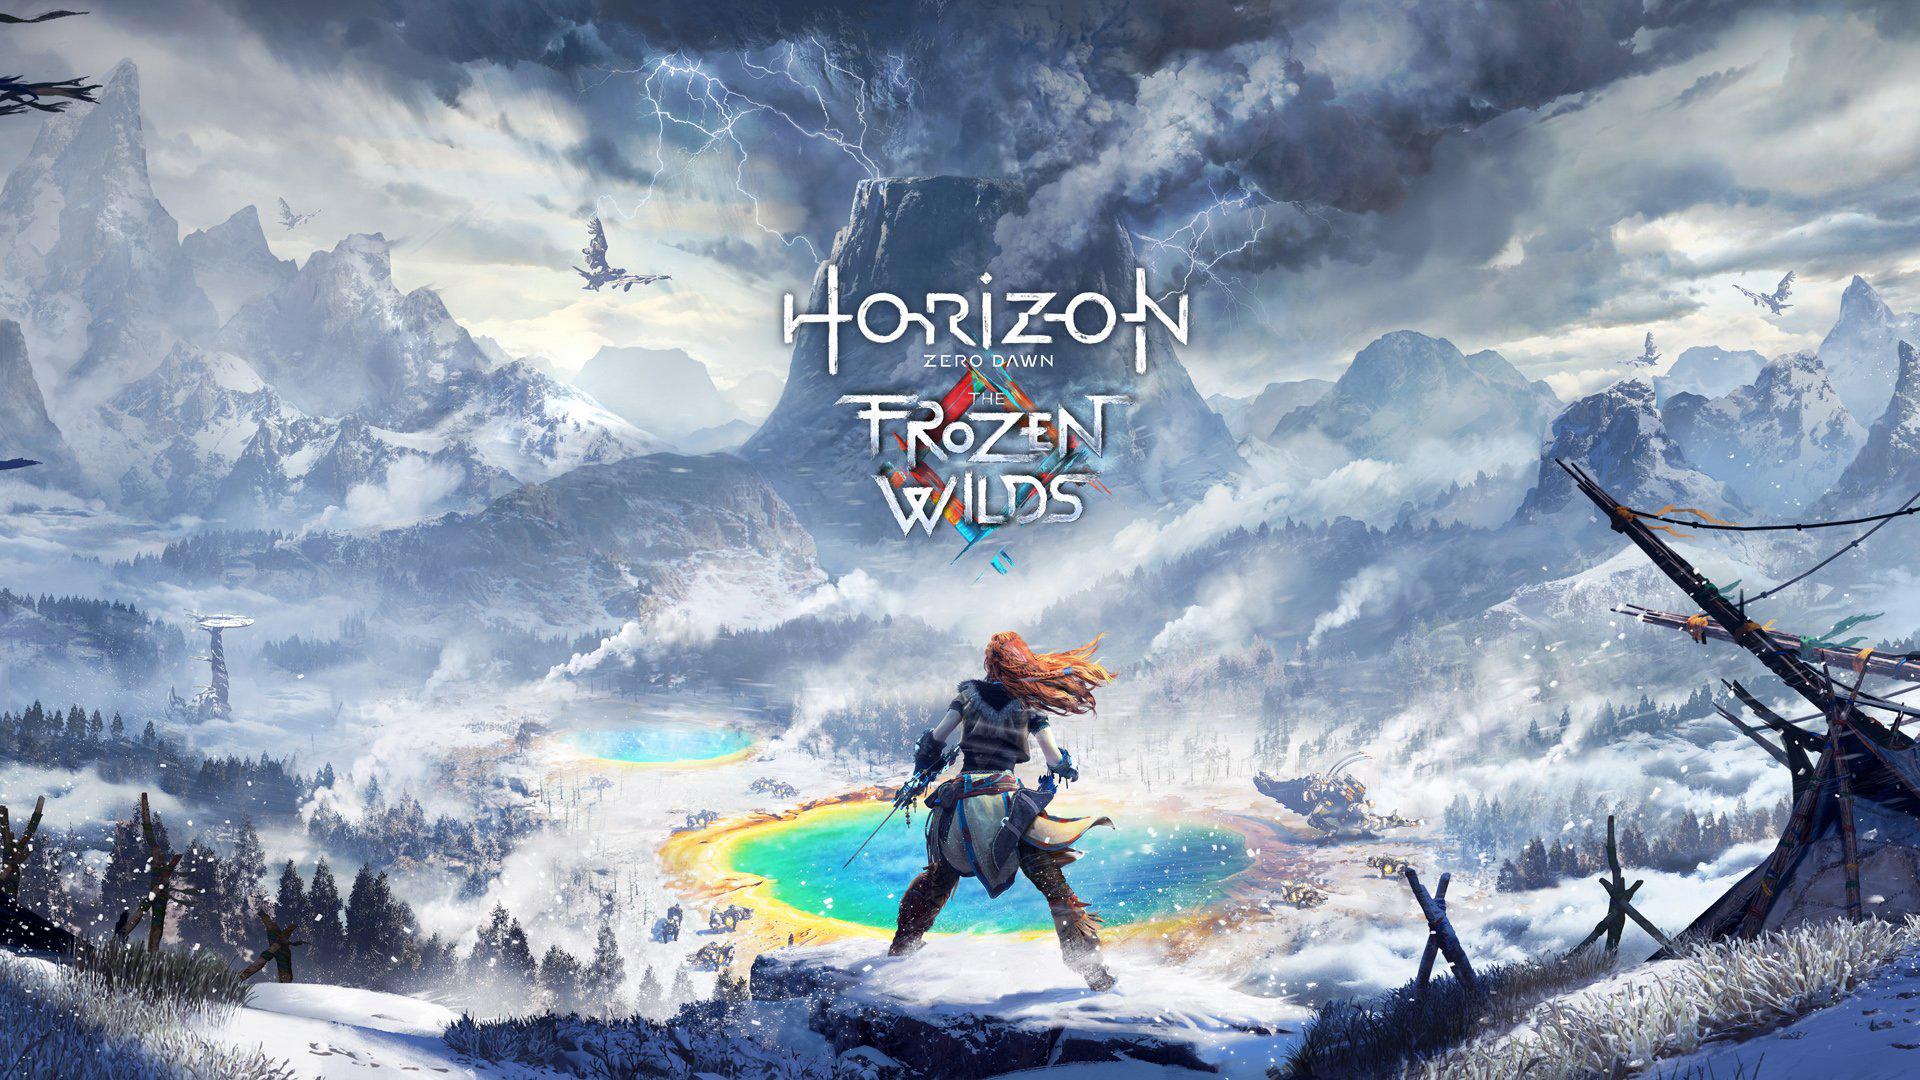 Horizon Zero Dawn's story expansion is The Frozen Wilds screenshot